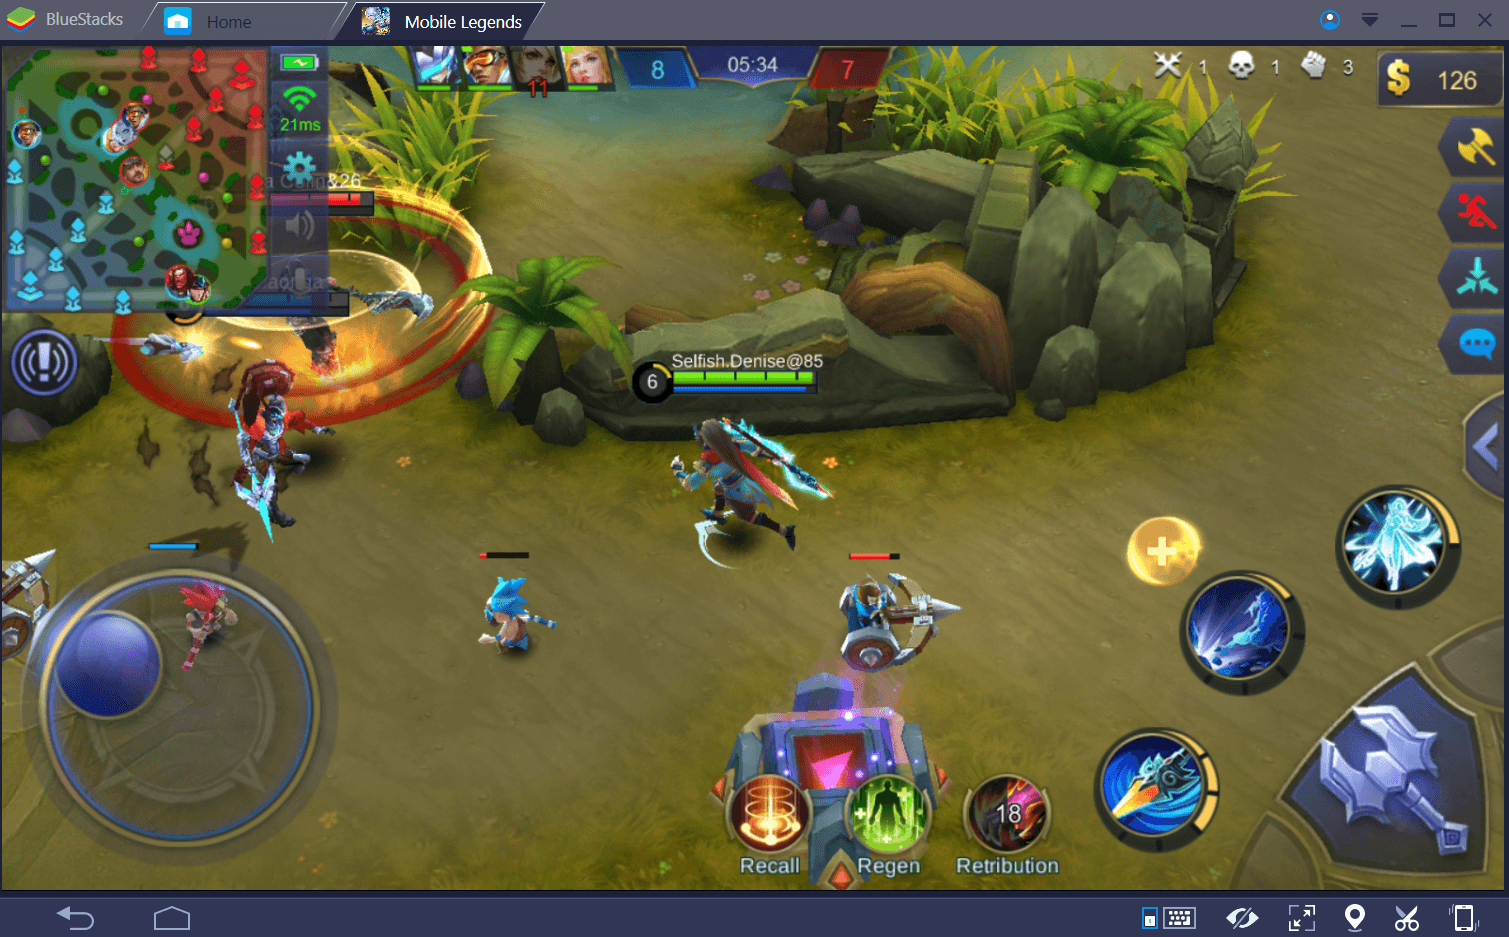 Mobile Legends: Bang Bang: دليل قتل الوحوش في الغابة